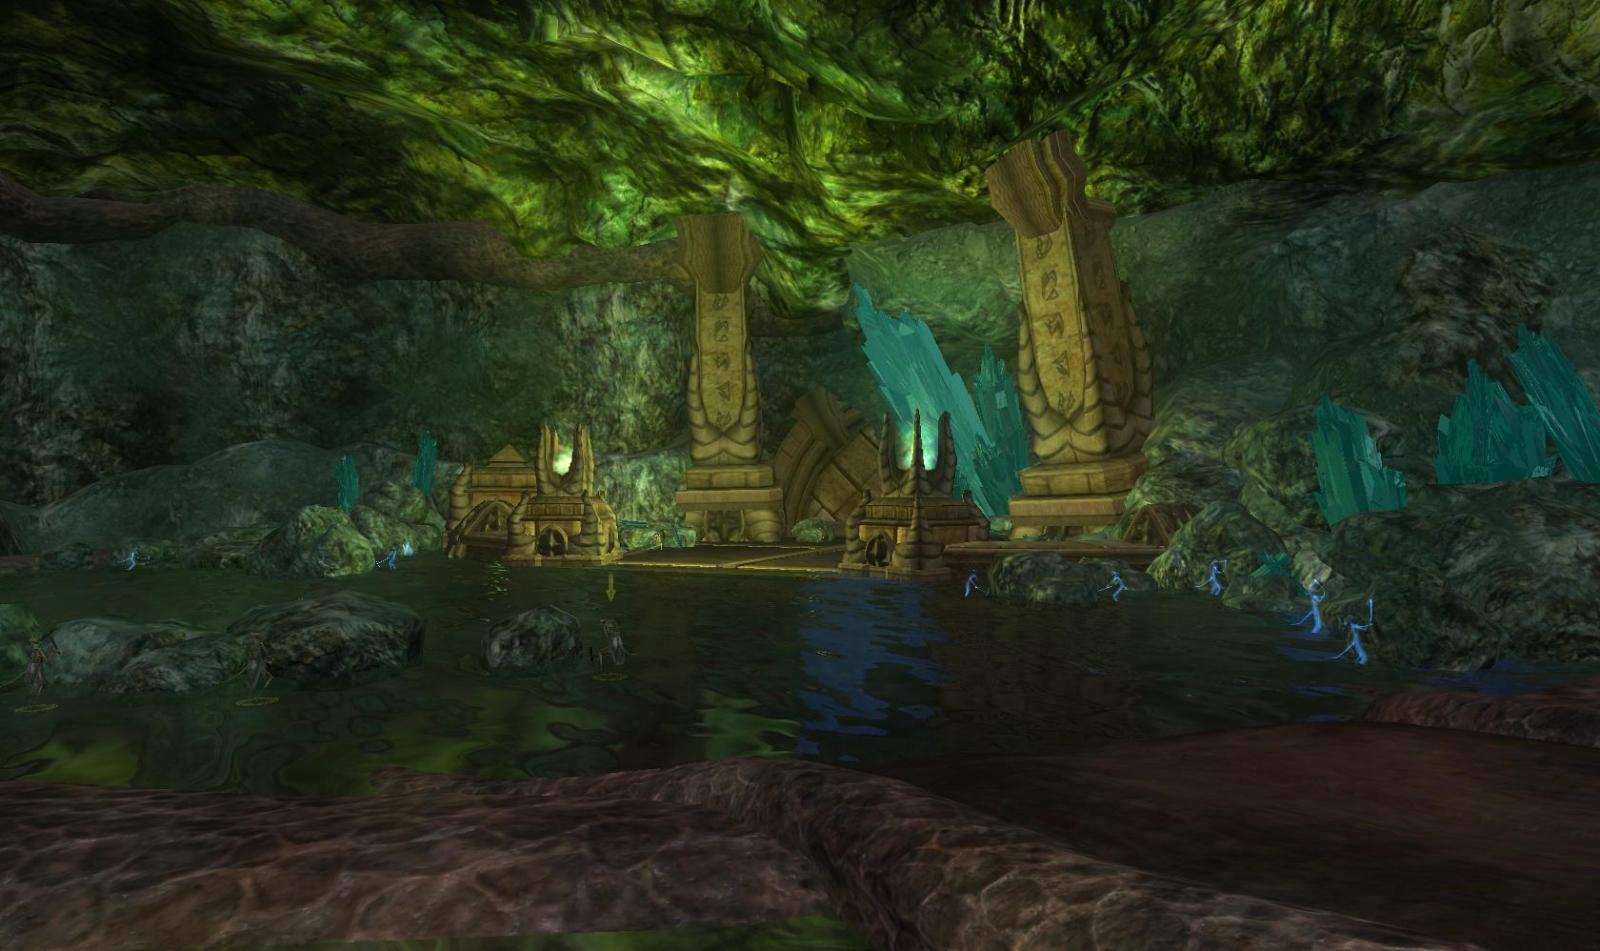 Chelsith: The Ancient Vault